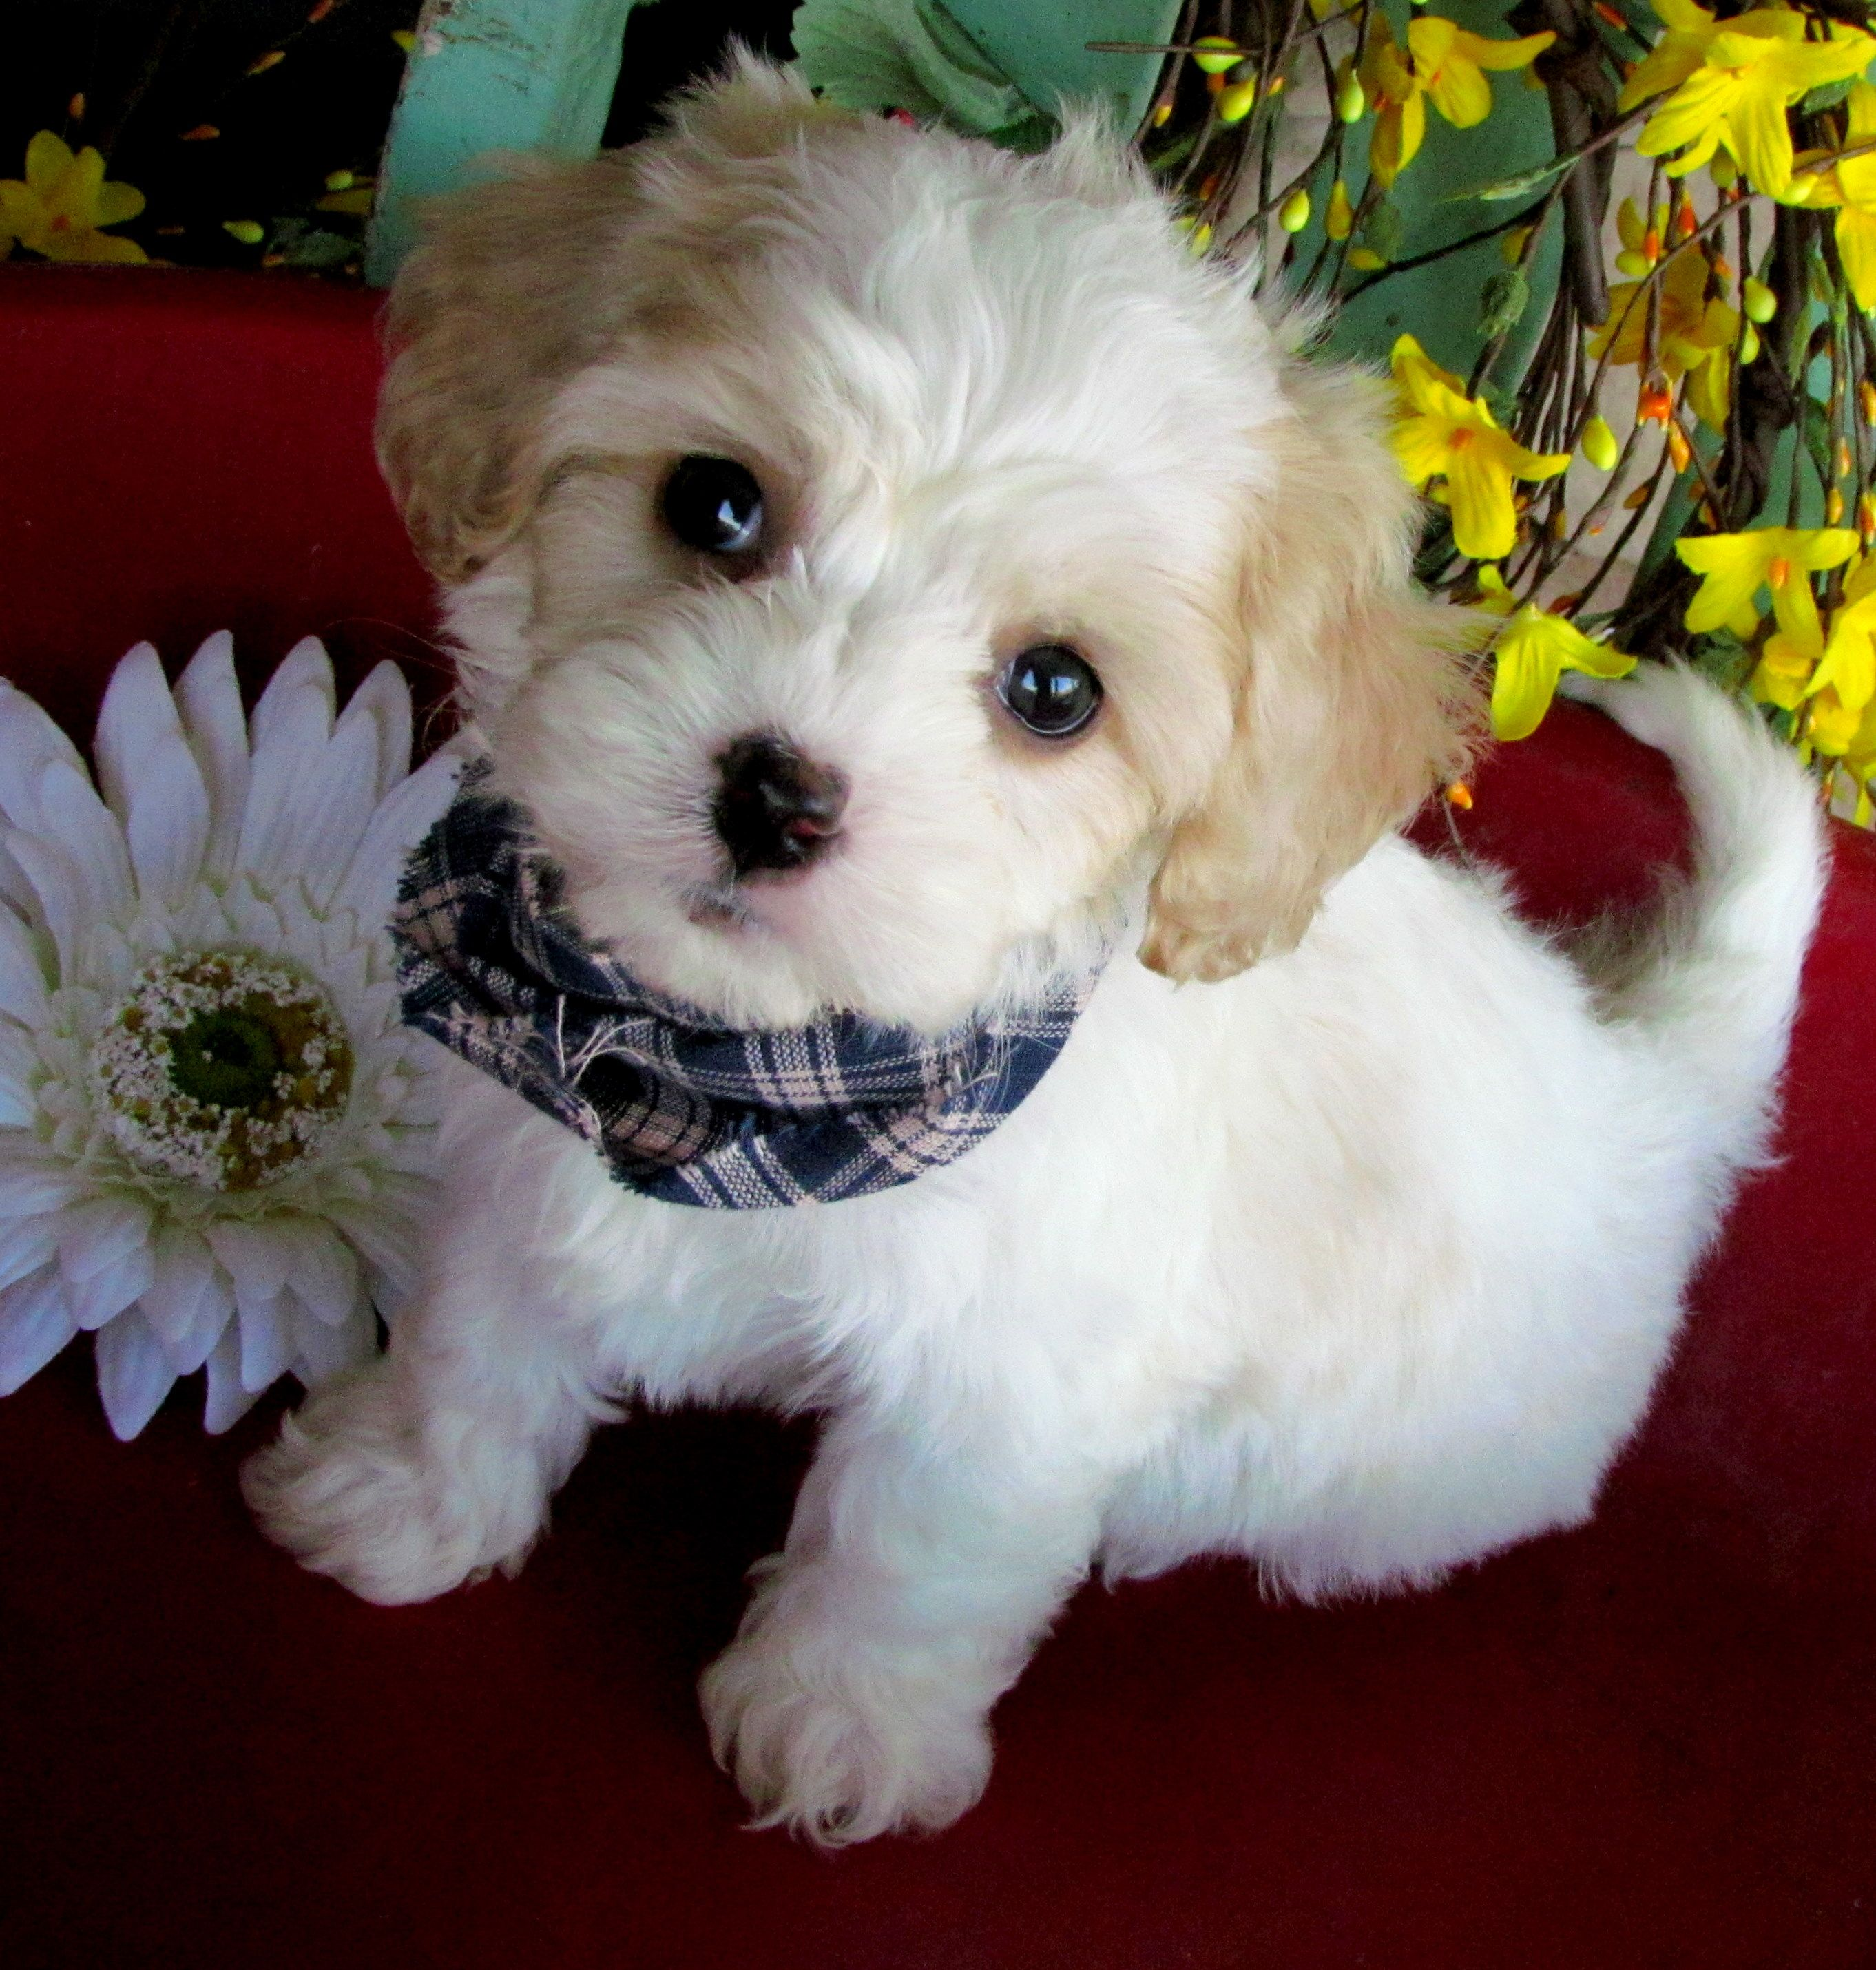 www cavachonsbydesign com Cavachon puppies for sale, Cavachon